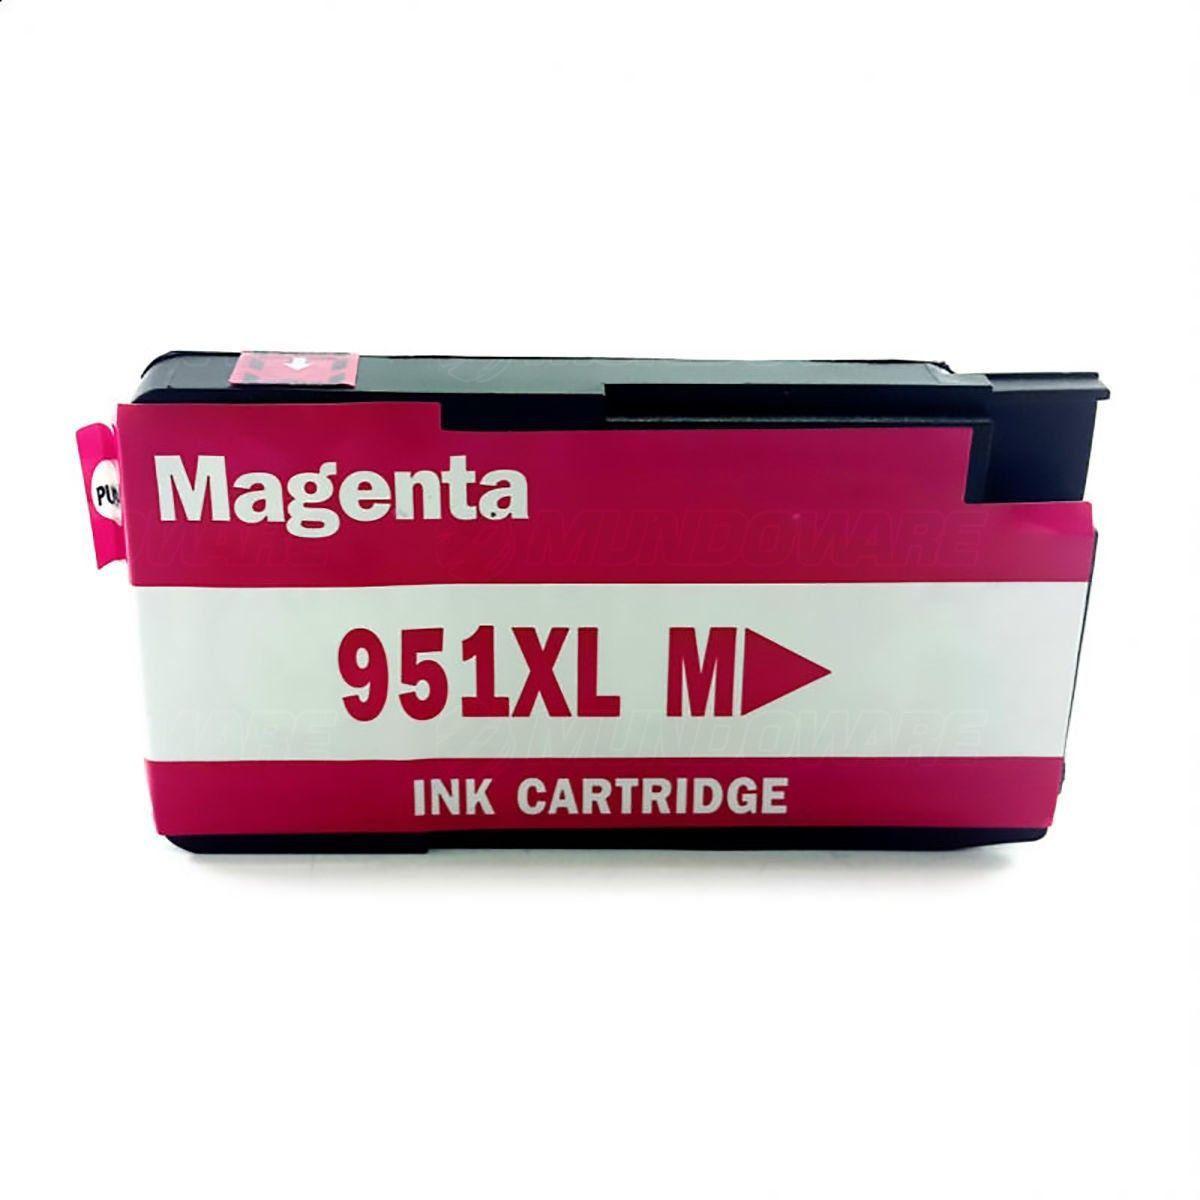 Compatível: Cartucho de Tinta 951xl 951 para HP Pro 8600 8100 8600w 8620 8610 251dw N811a N911g / Magenta / 27ml